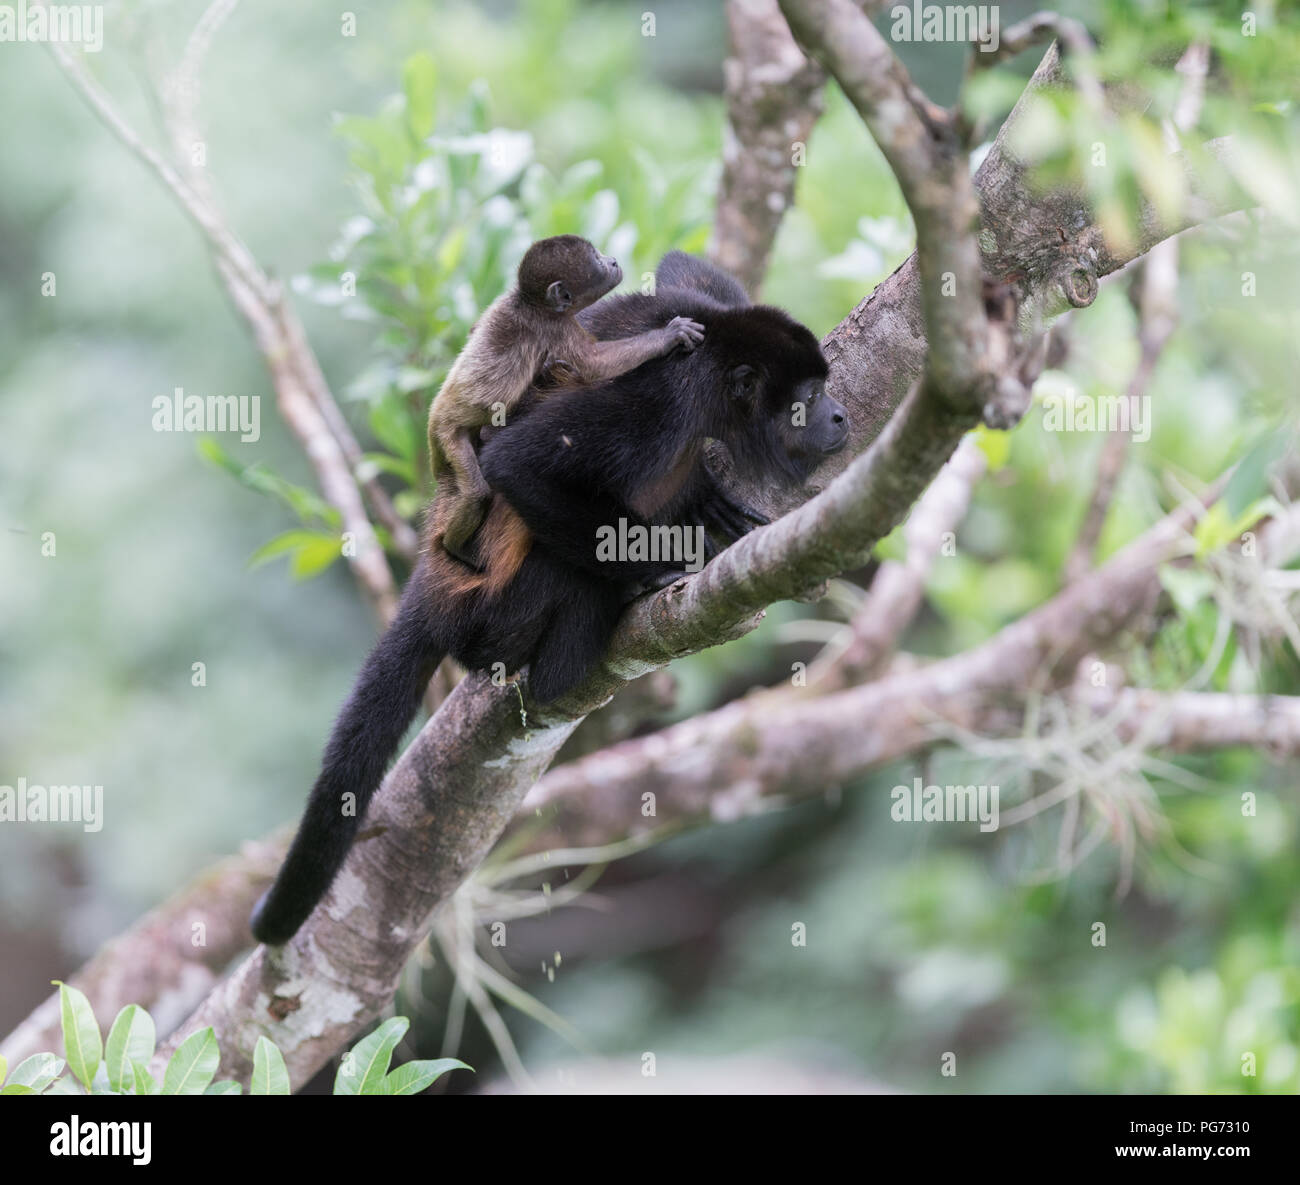 Howler monkey family in tree canopy - Stock Image